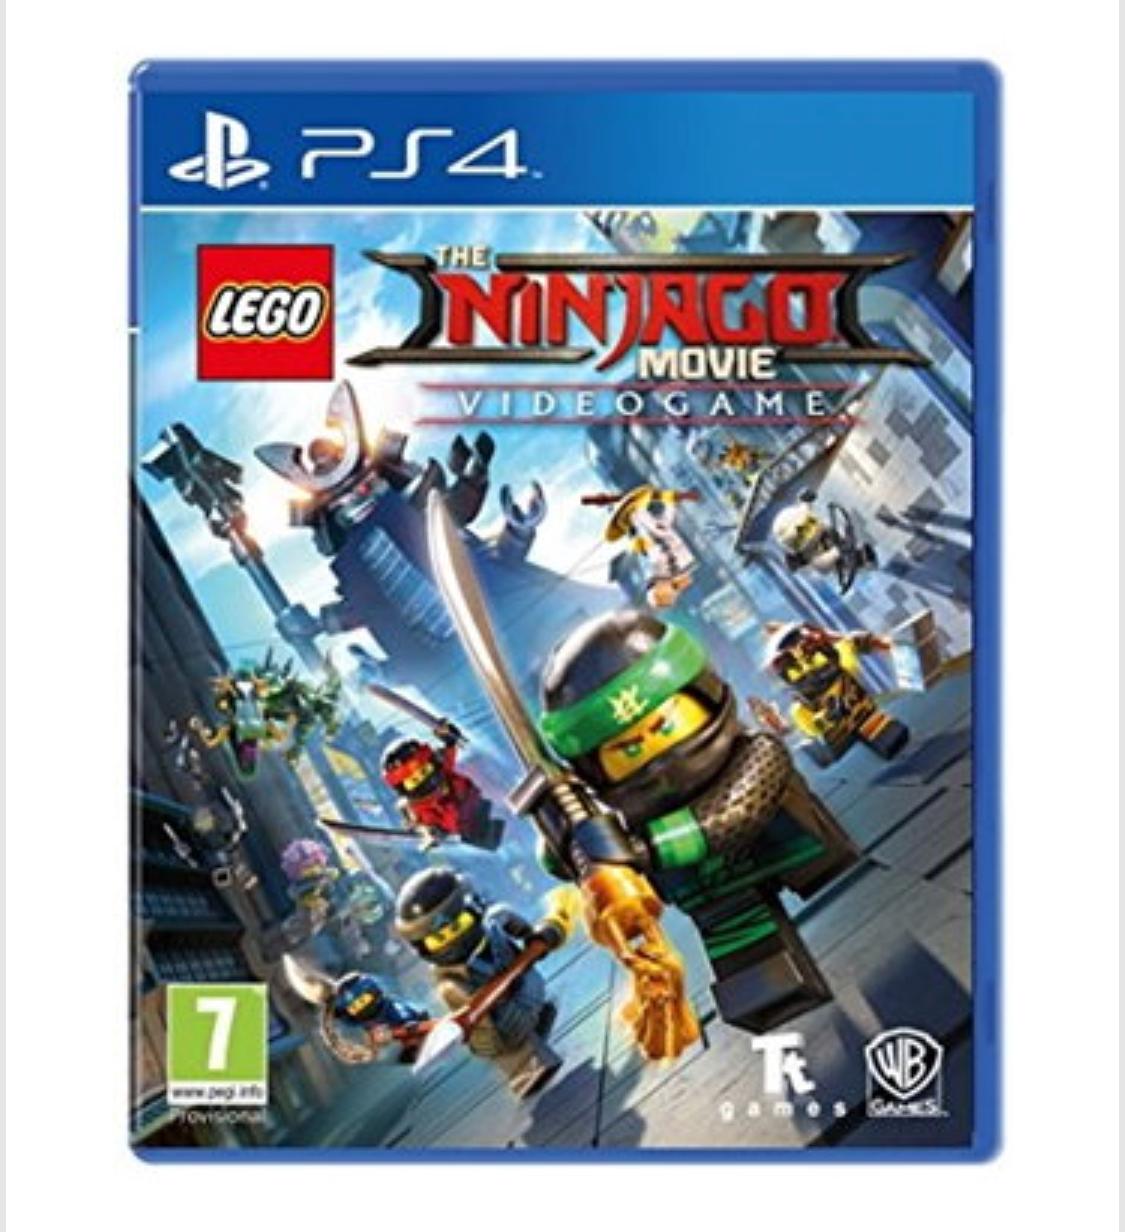 LEGO The Ninjago Movie: Videogame £14.99(PS4)/ £22.85(Nintendo) delivered @ Base,